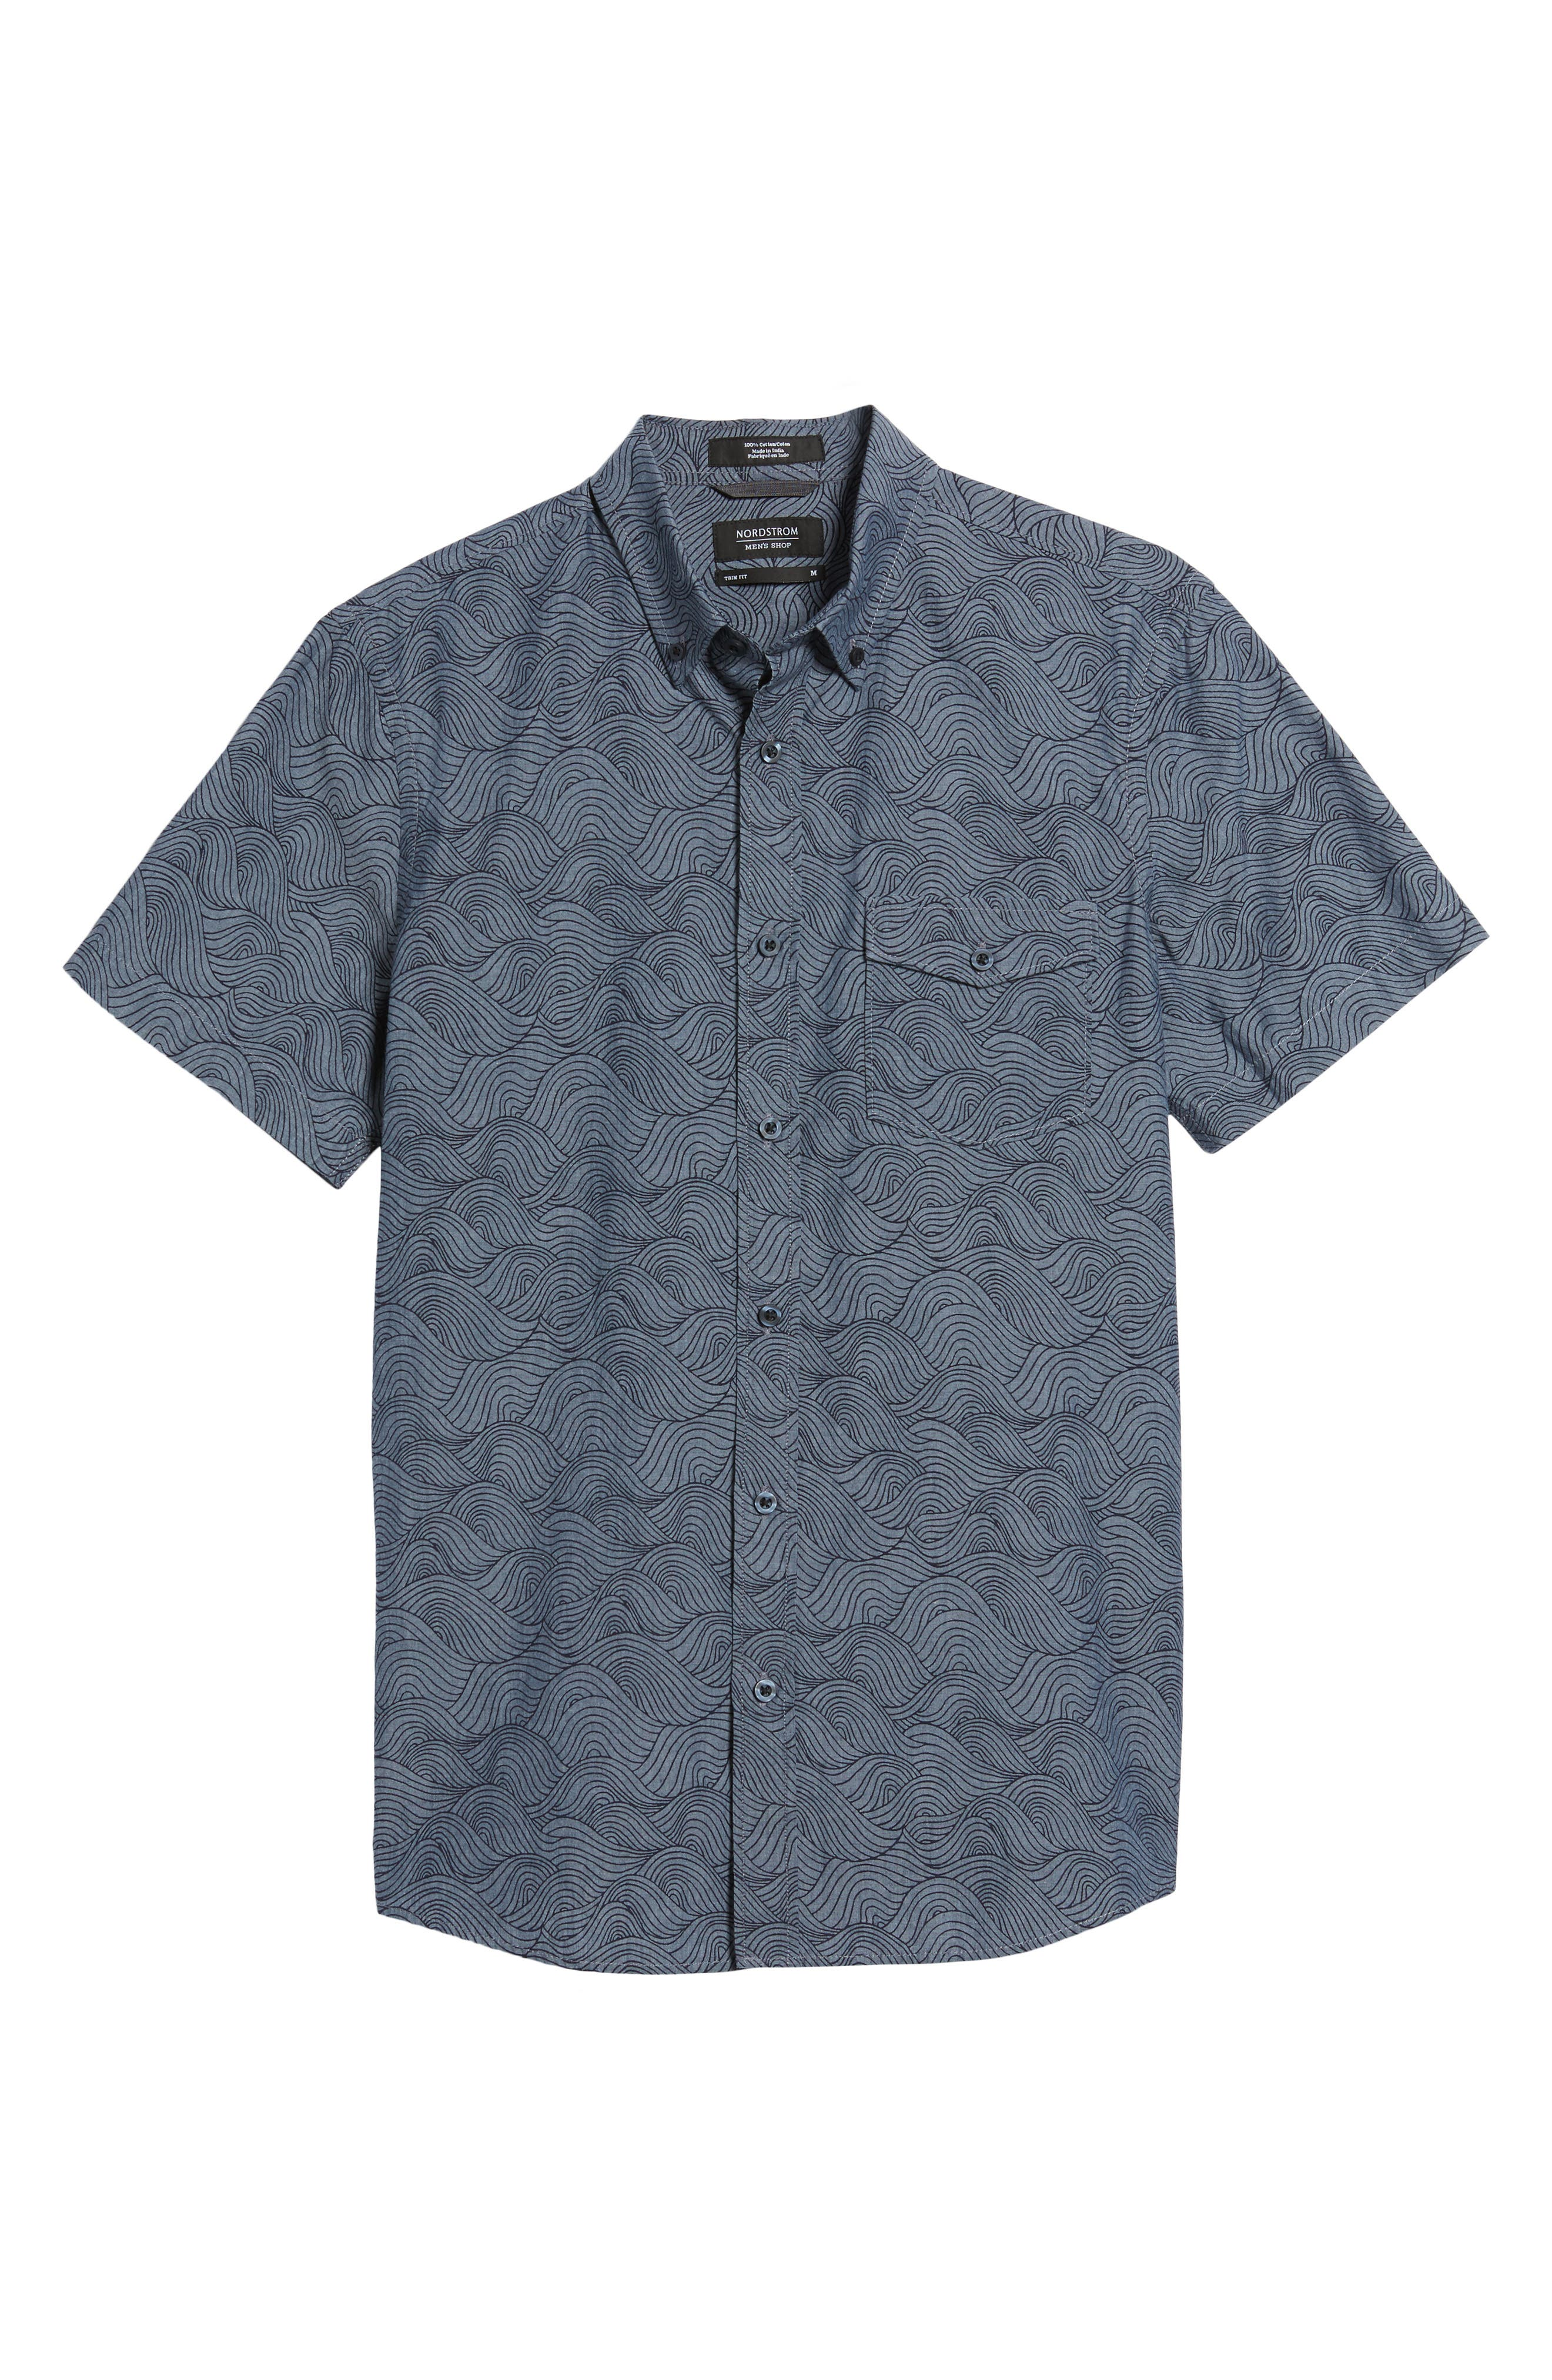 Trim Fit Ivy Print Sport Shirt,                             Alternate thumbnail 6, color,                             Grey Onyx Rolling Waves